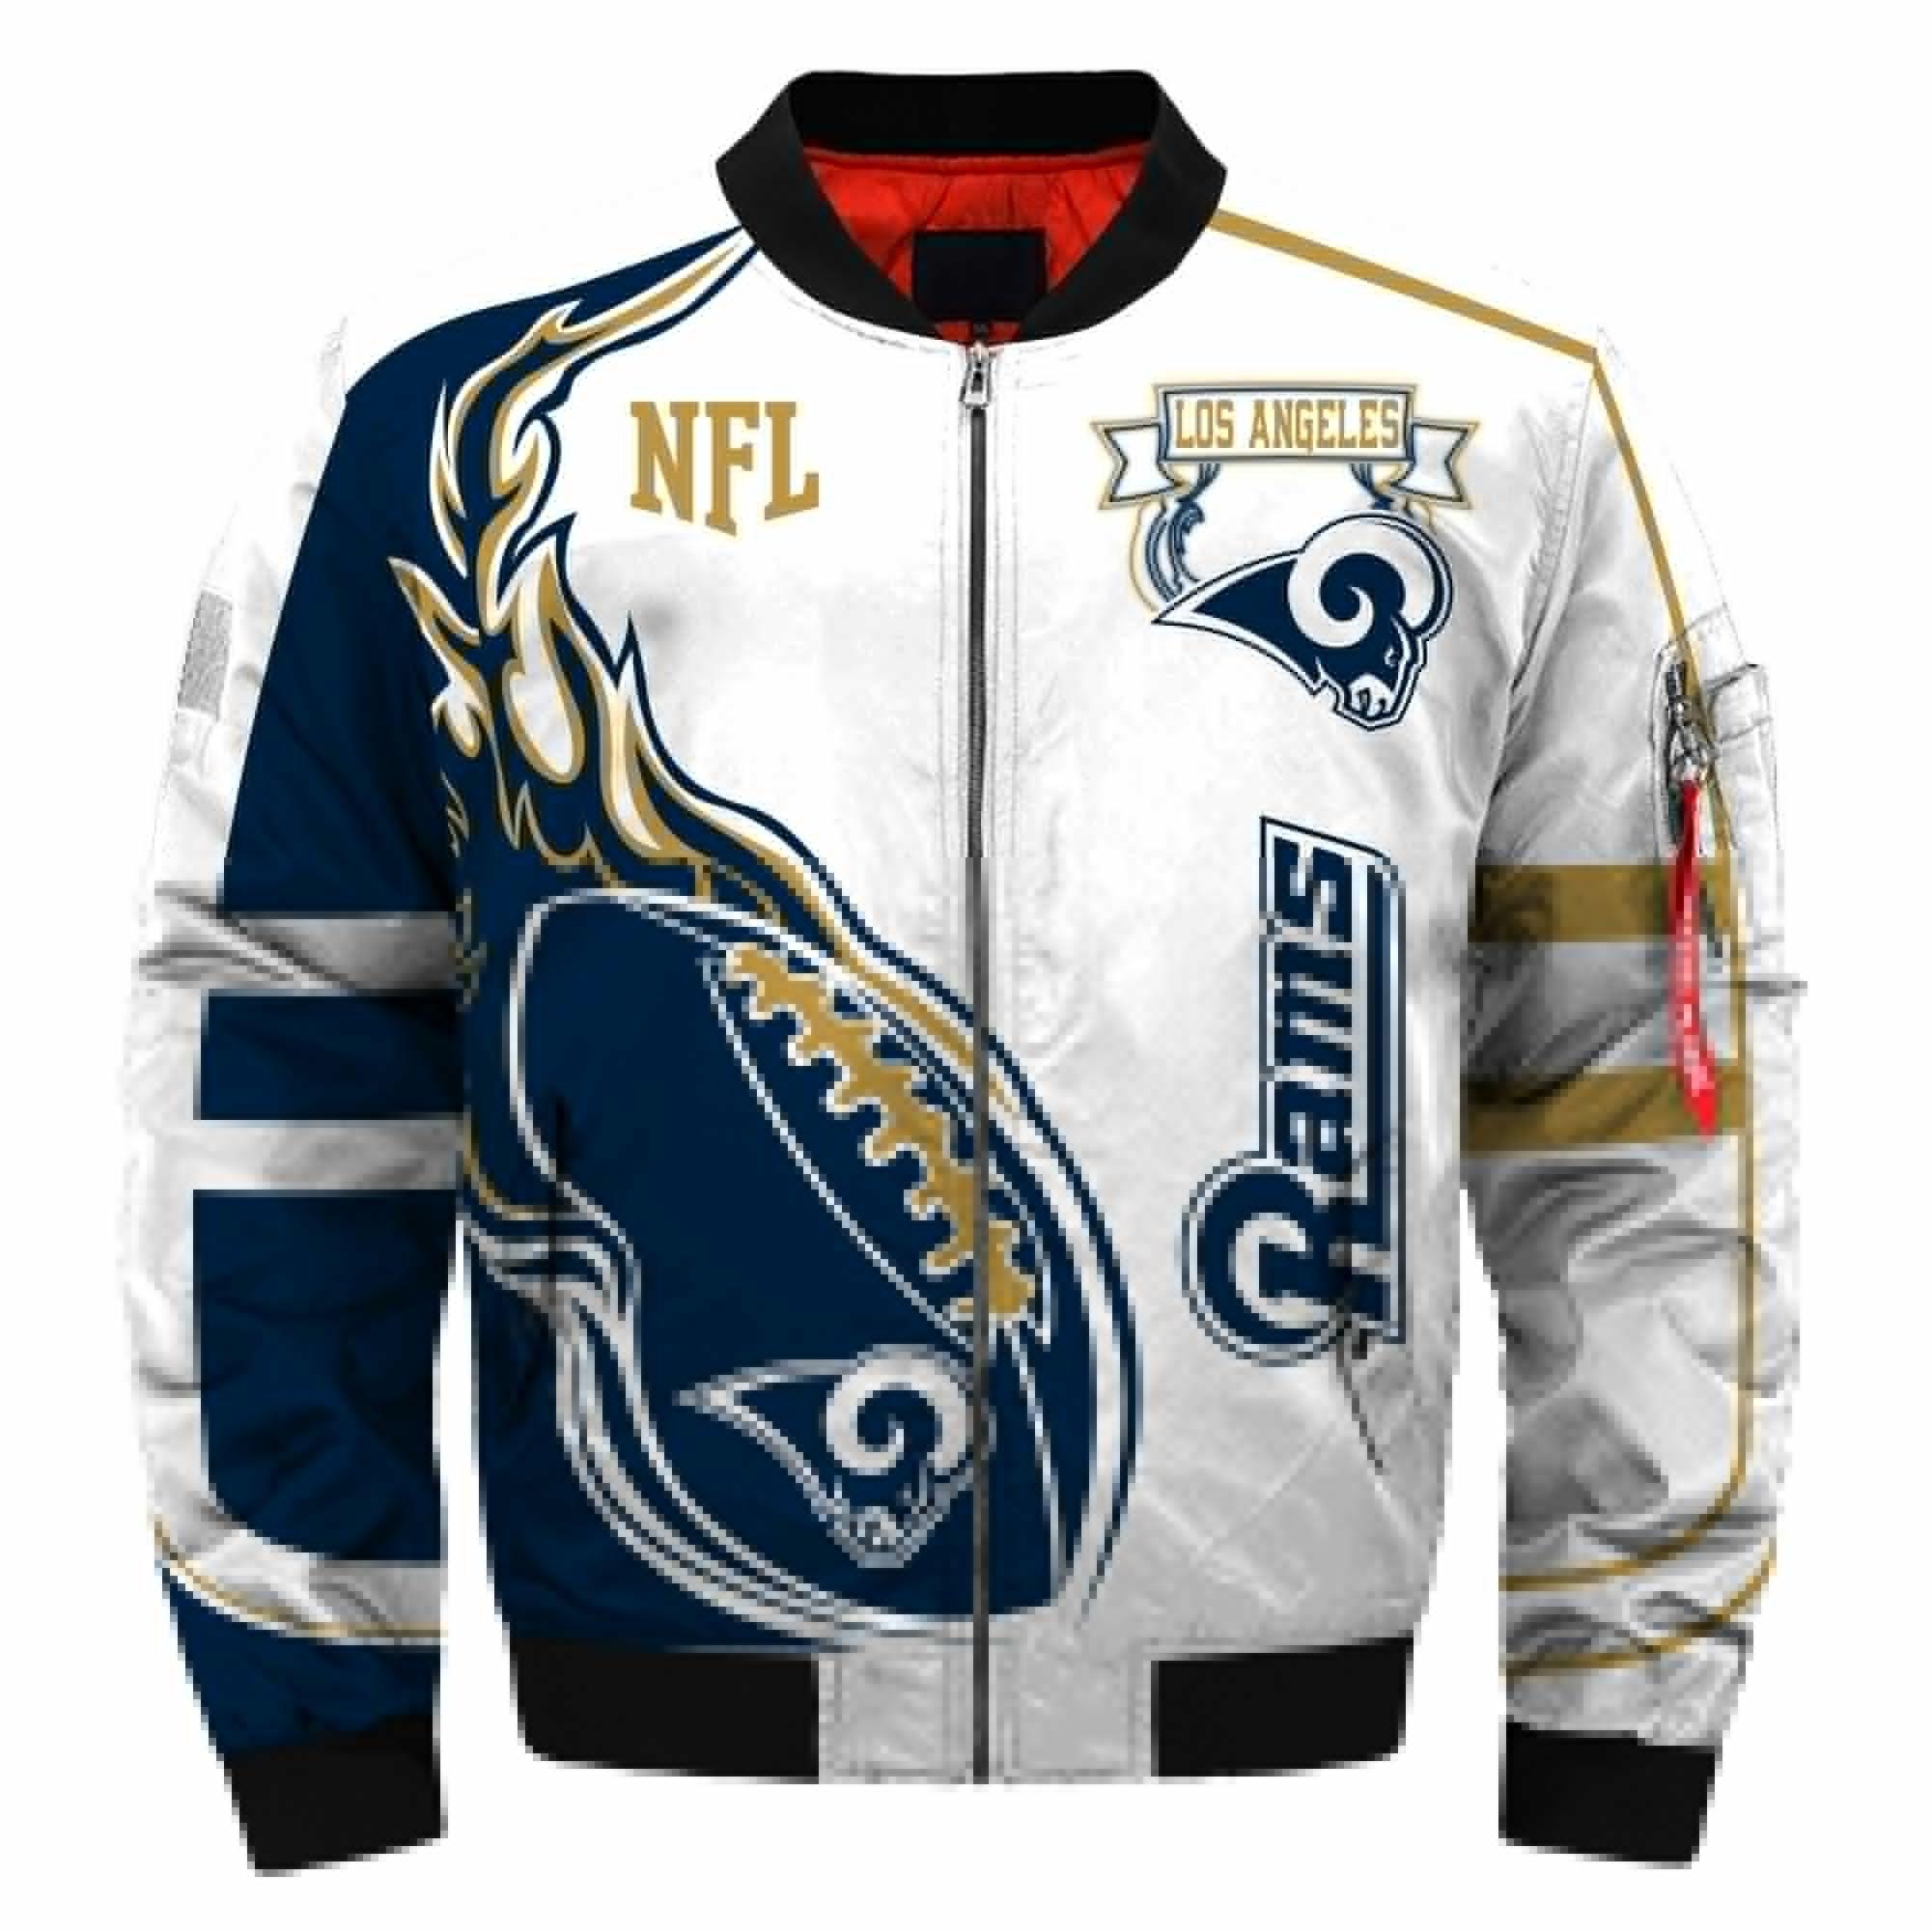 Los Angeles Rams Bomber Jacket Men Women CottonPadded Air